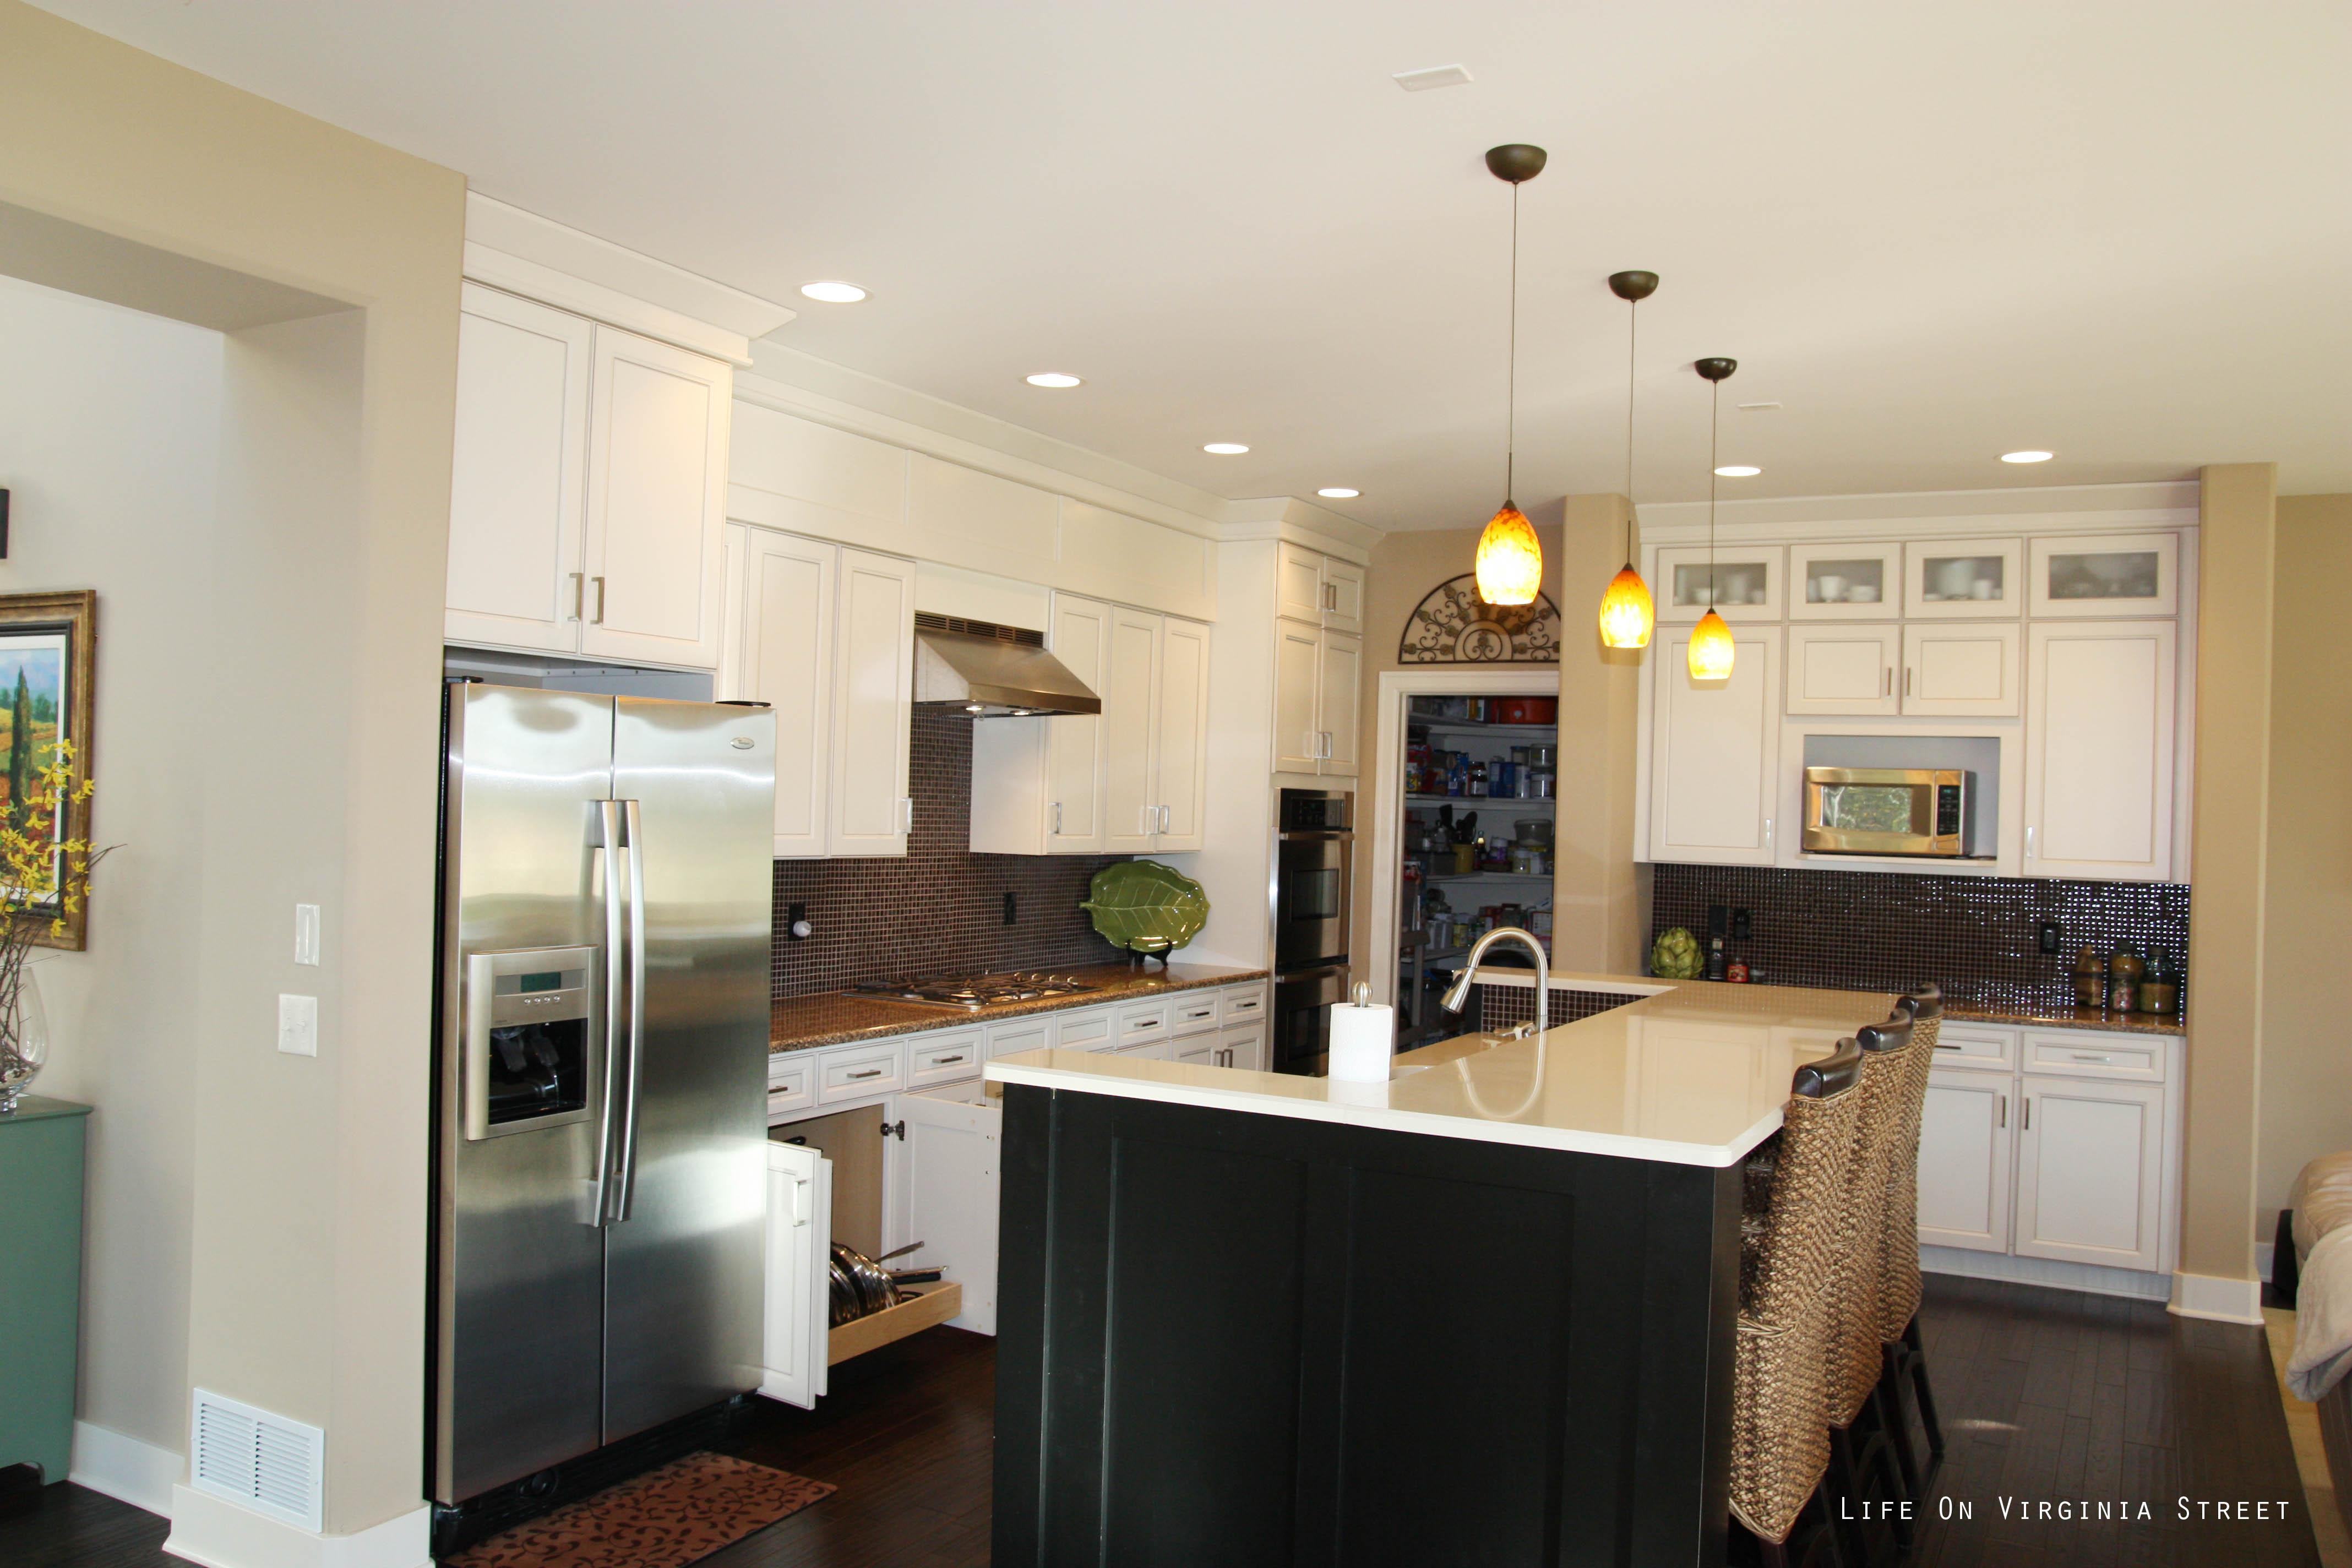 Img 6796 - Cool kitchen pendant lights ...